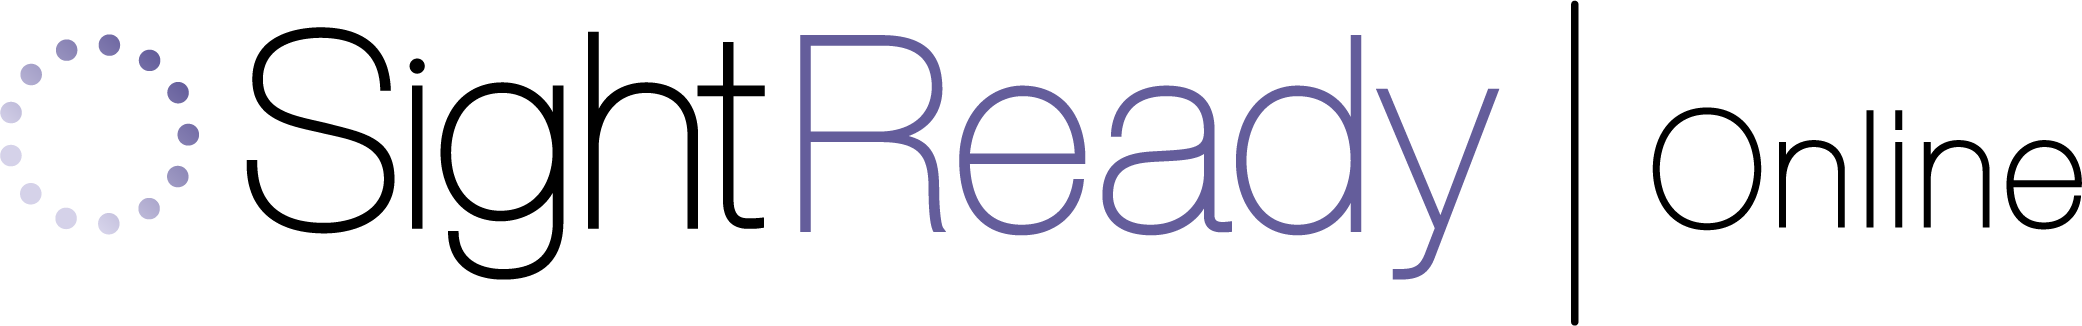 SightReady_Online-Logo_RGB.png